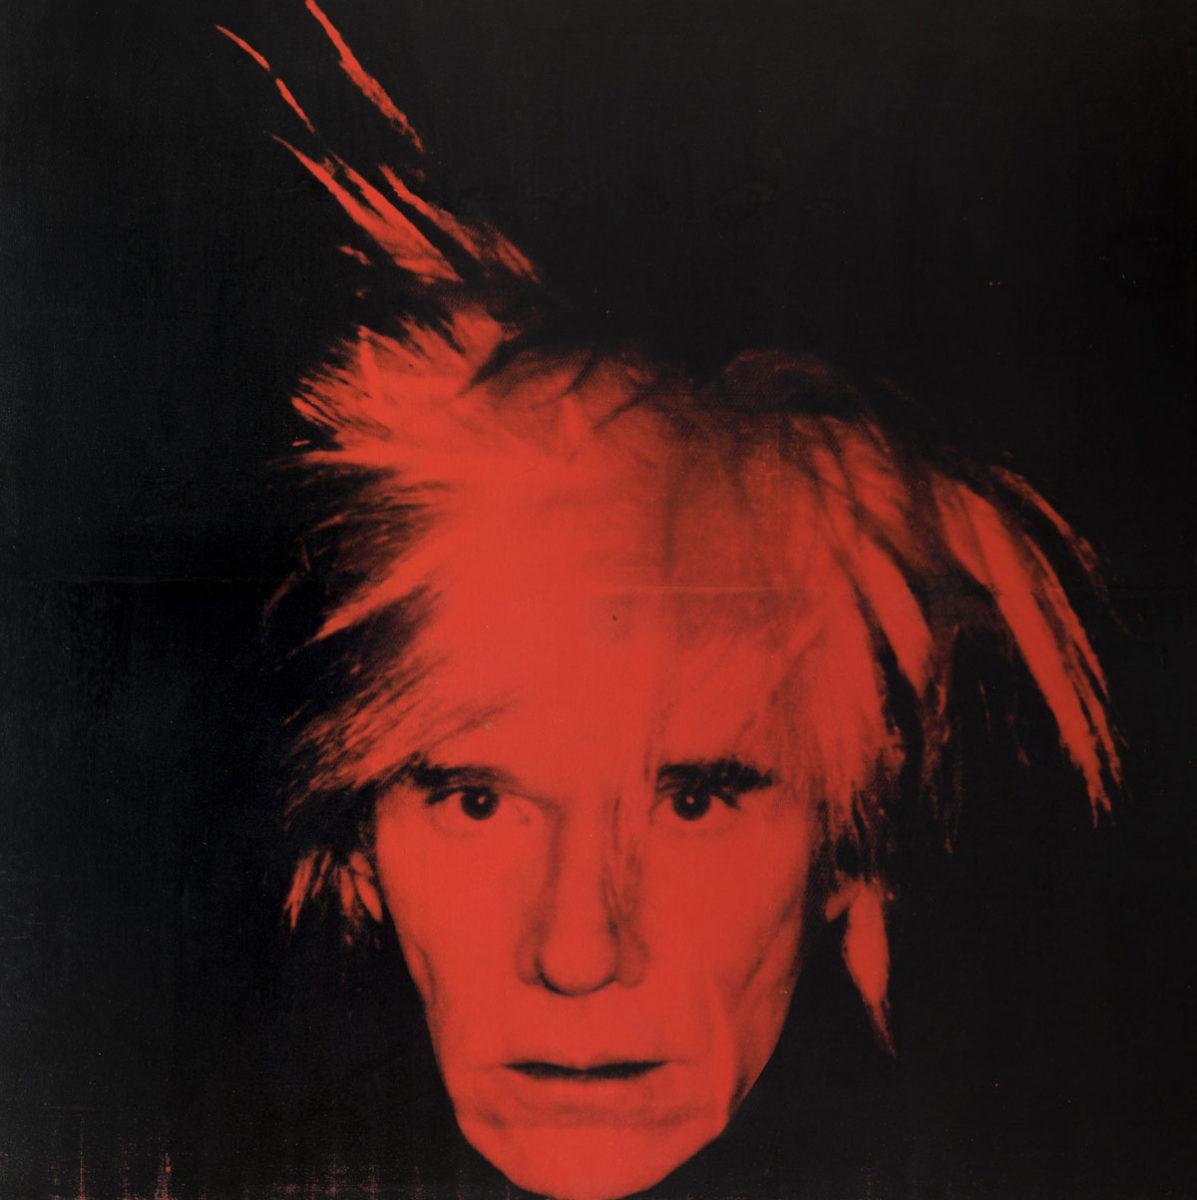 Tate Modern: ψηφιακή περιήγηση στην έκθεση «Andy Warhol»